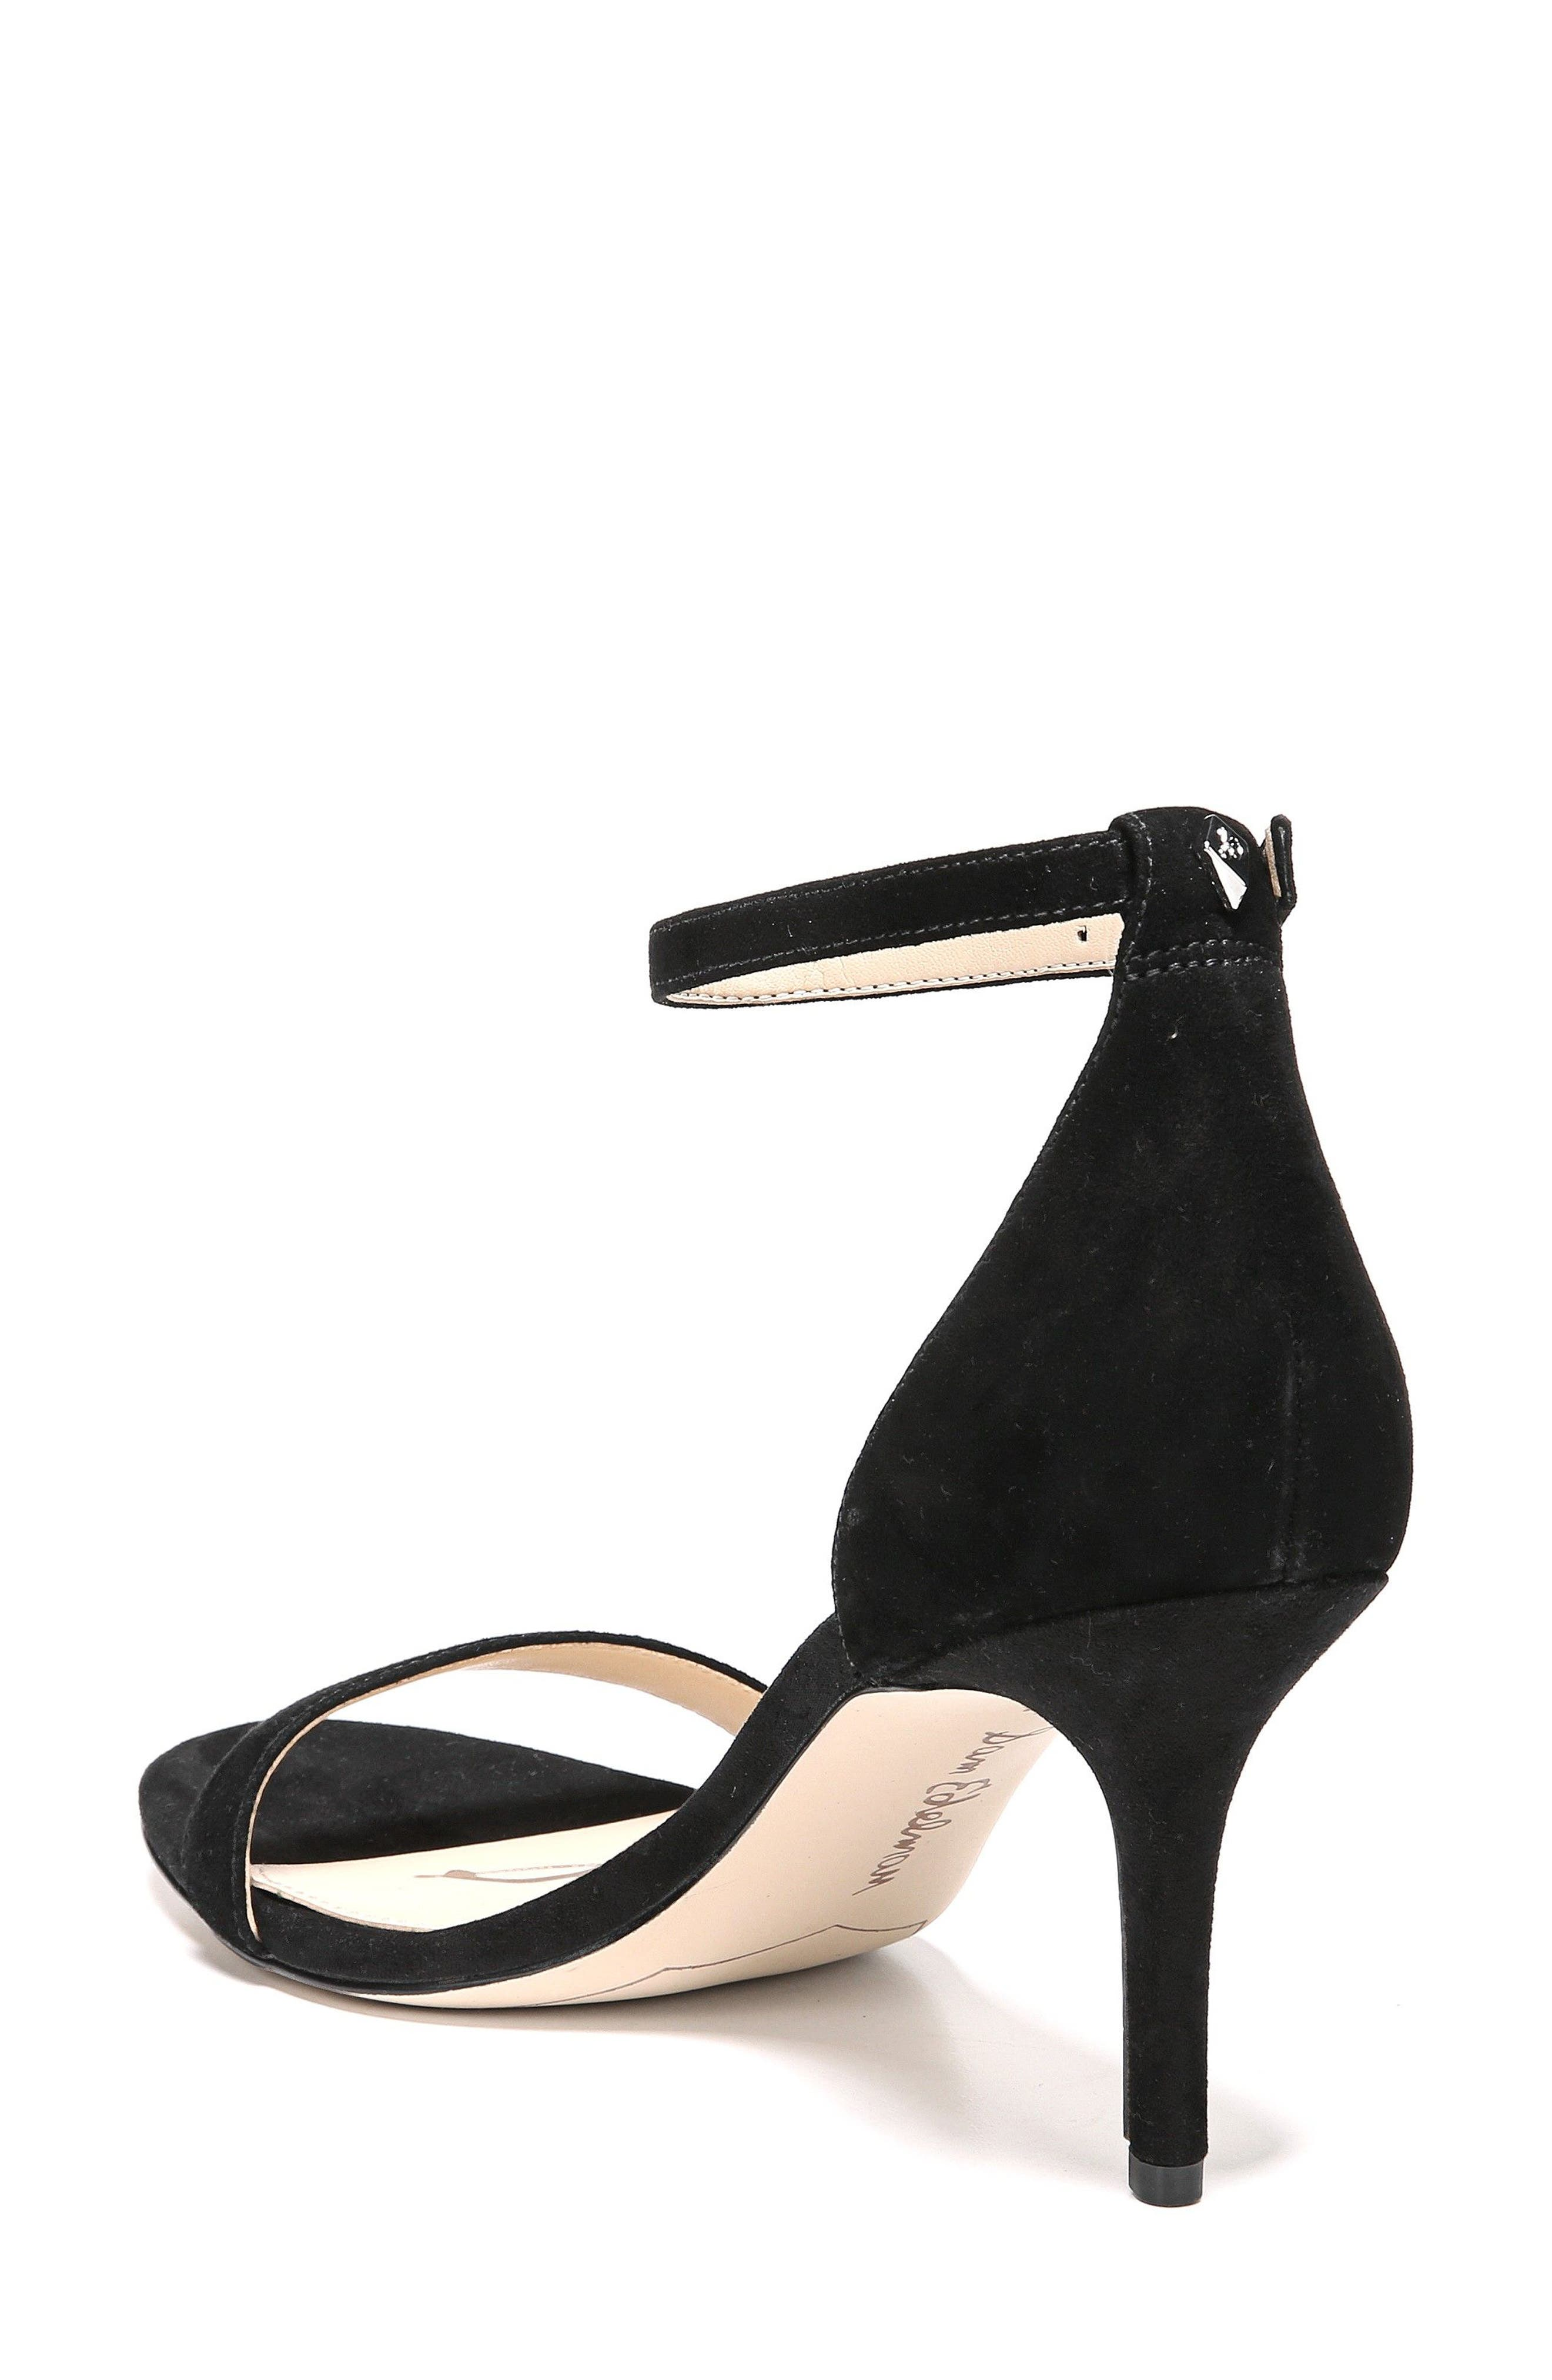 ,                             'Patti' Ankle Strap Sandal,                             Alternate thumbnail 151, color,                             005